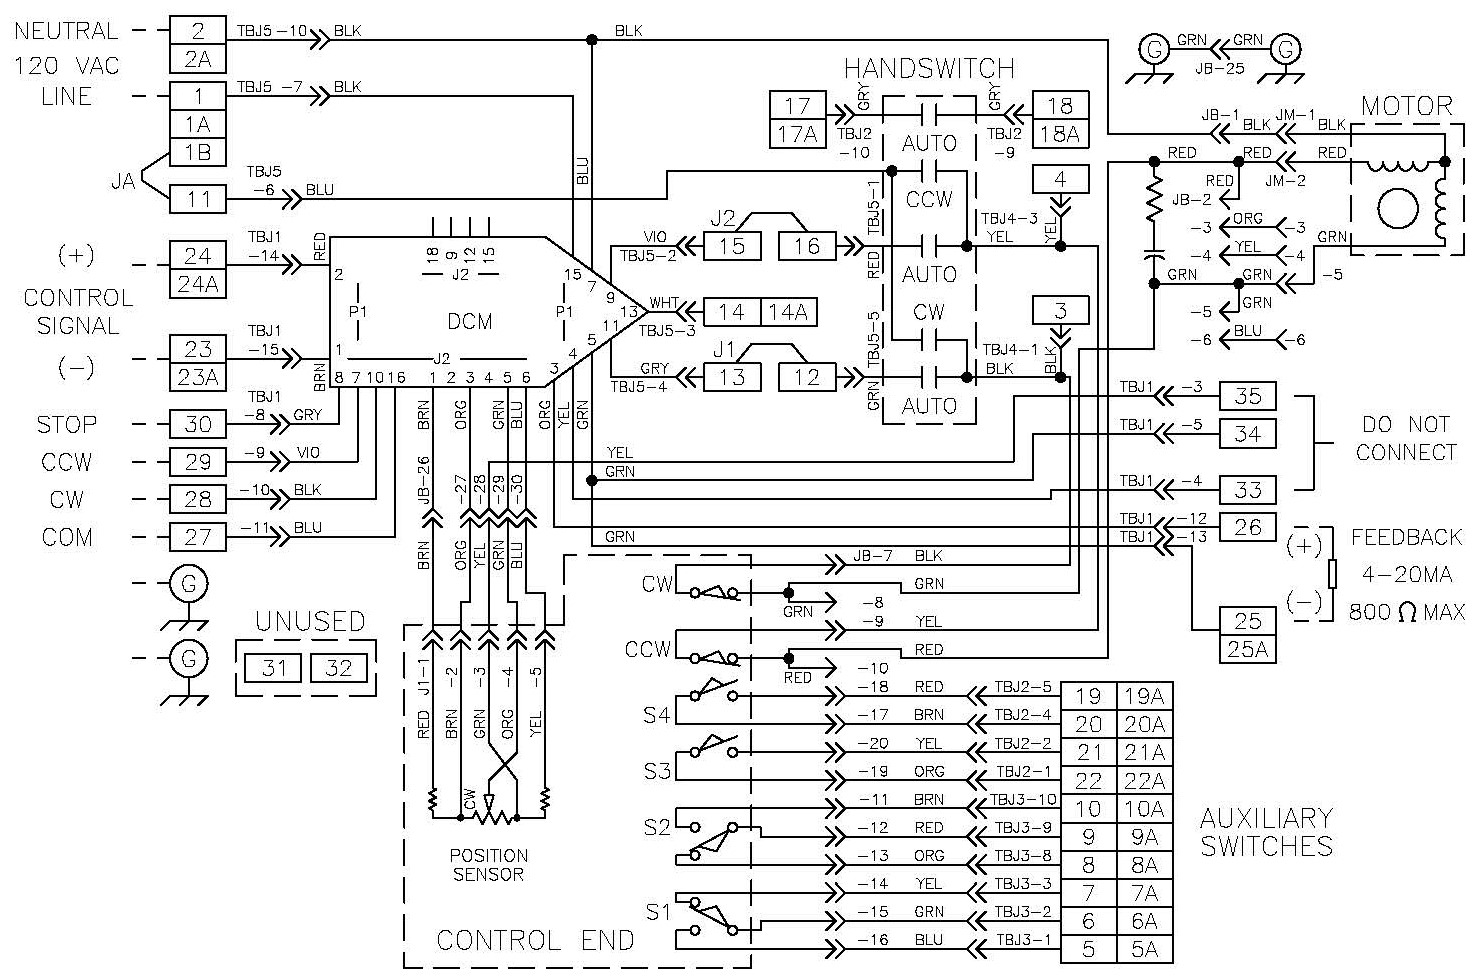 Radio Control Circuit Diagramhs101 Hs201 Remotecontrolcircuit